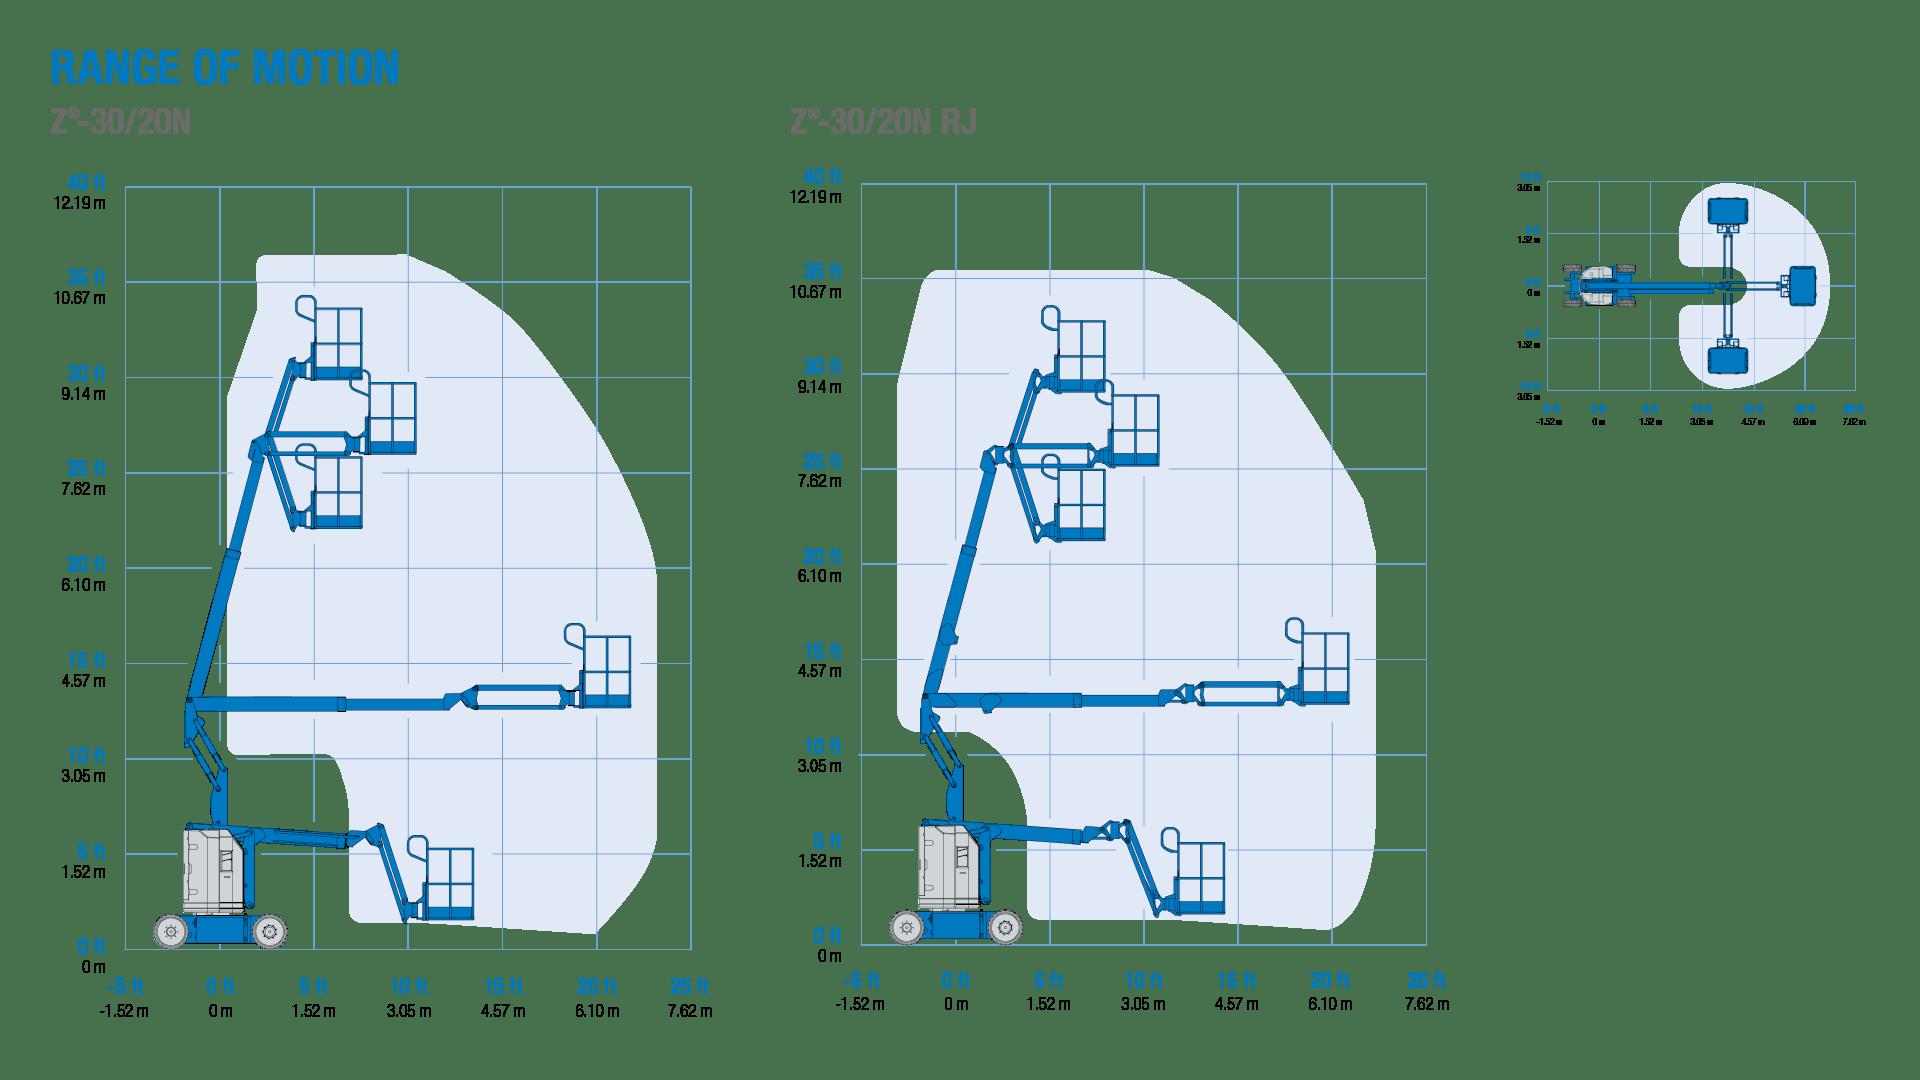 range of motion genie z 30 20 articulating boom lift [ 1920 x 1080 Pixel ]